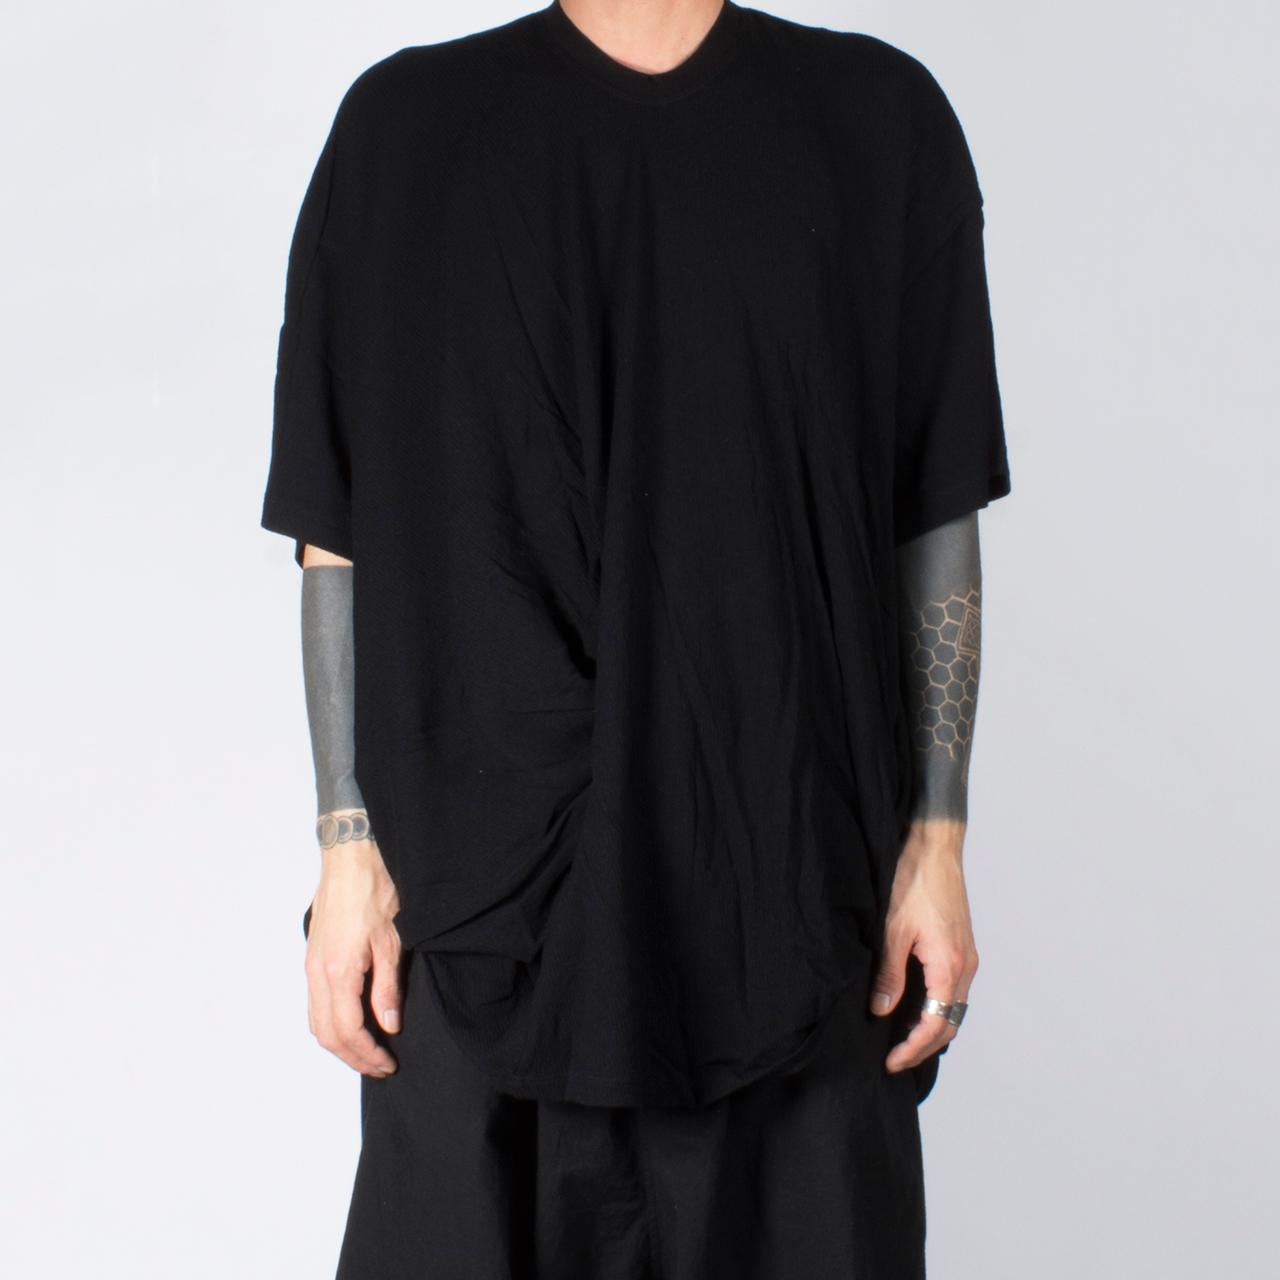 697CUM7-BLACK / フロントドレープ Tシャツ